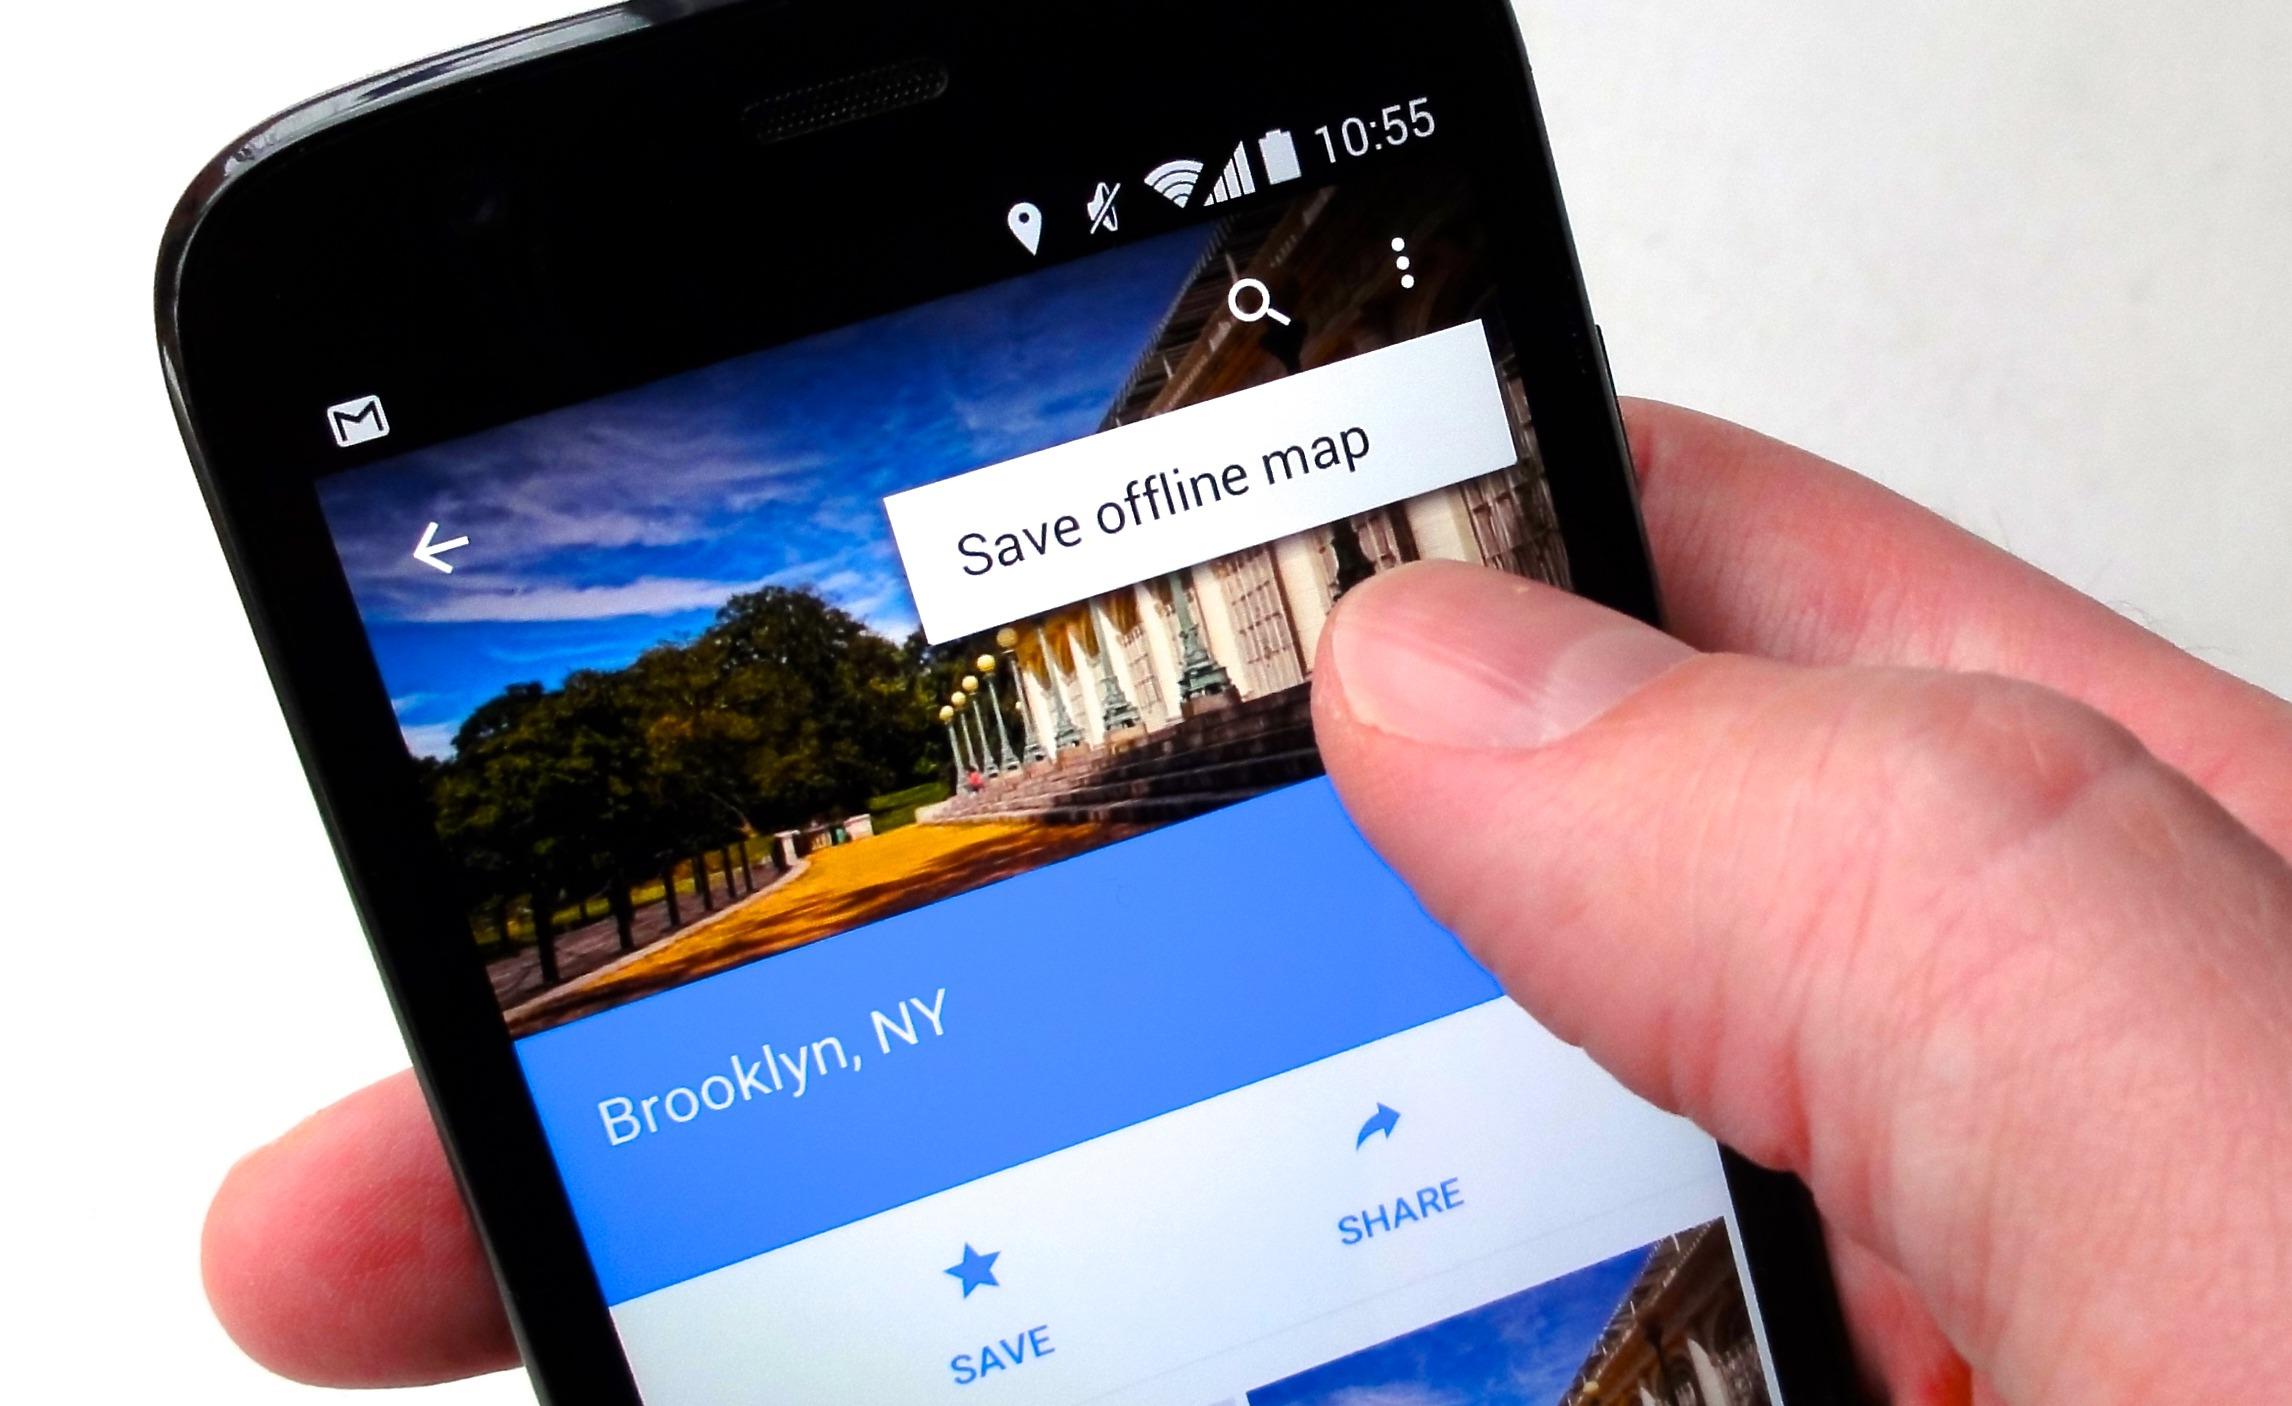 google_maps_app_save_offline_map